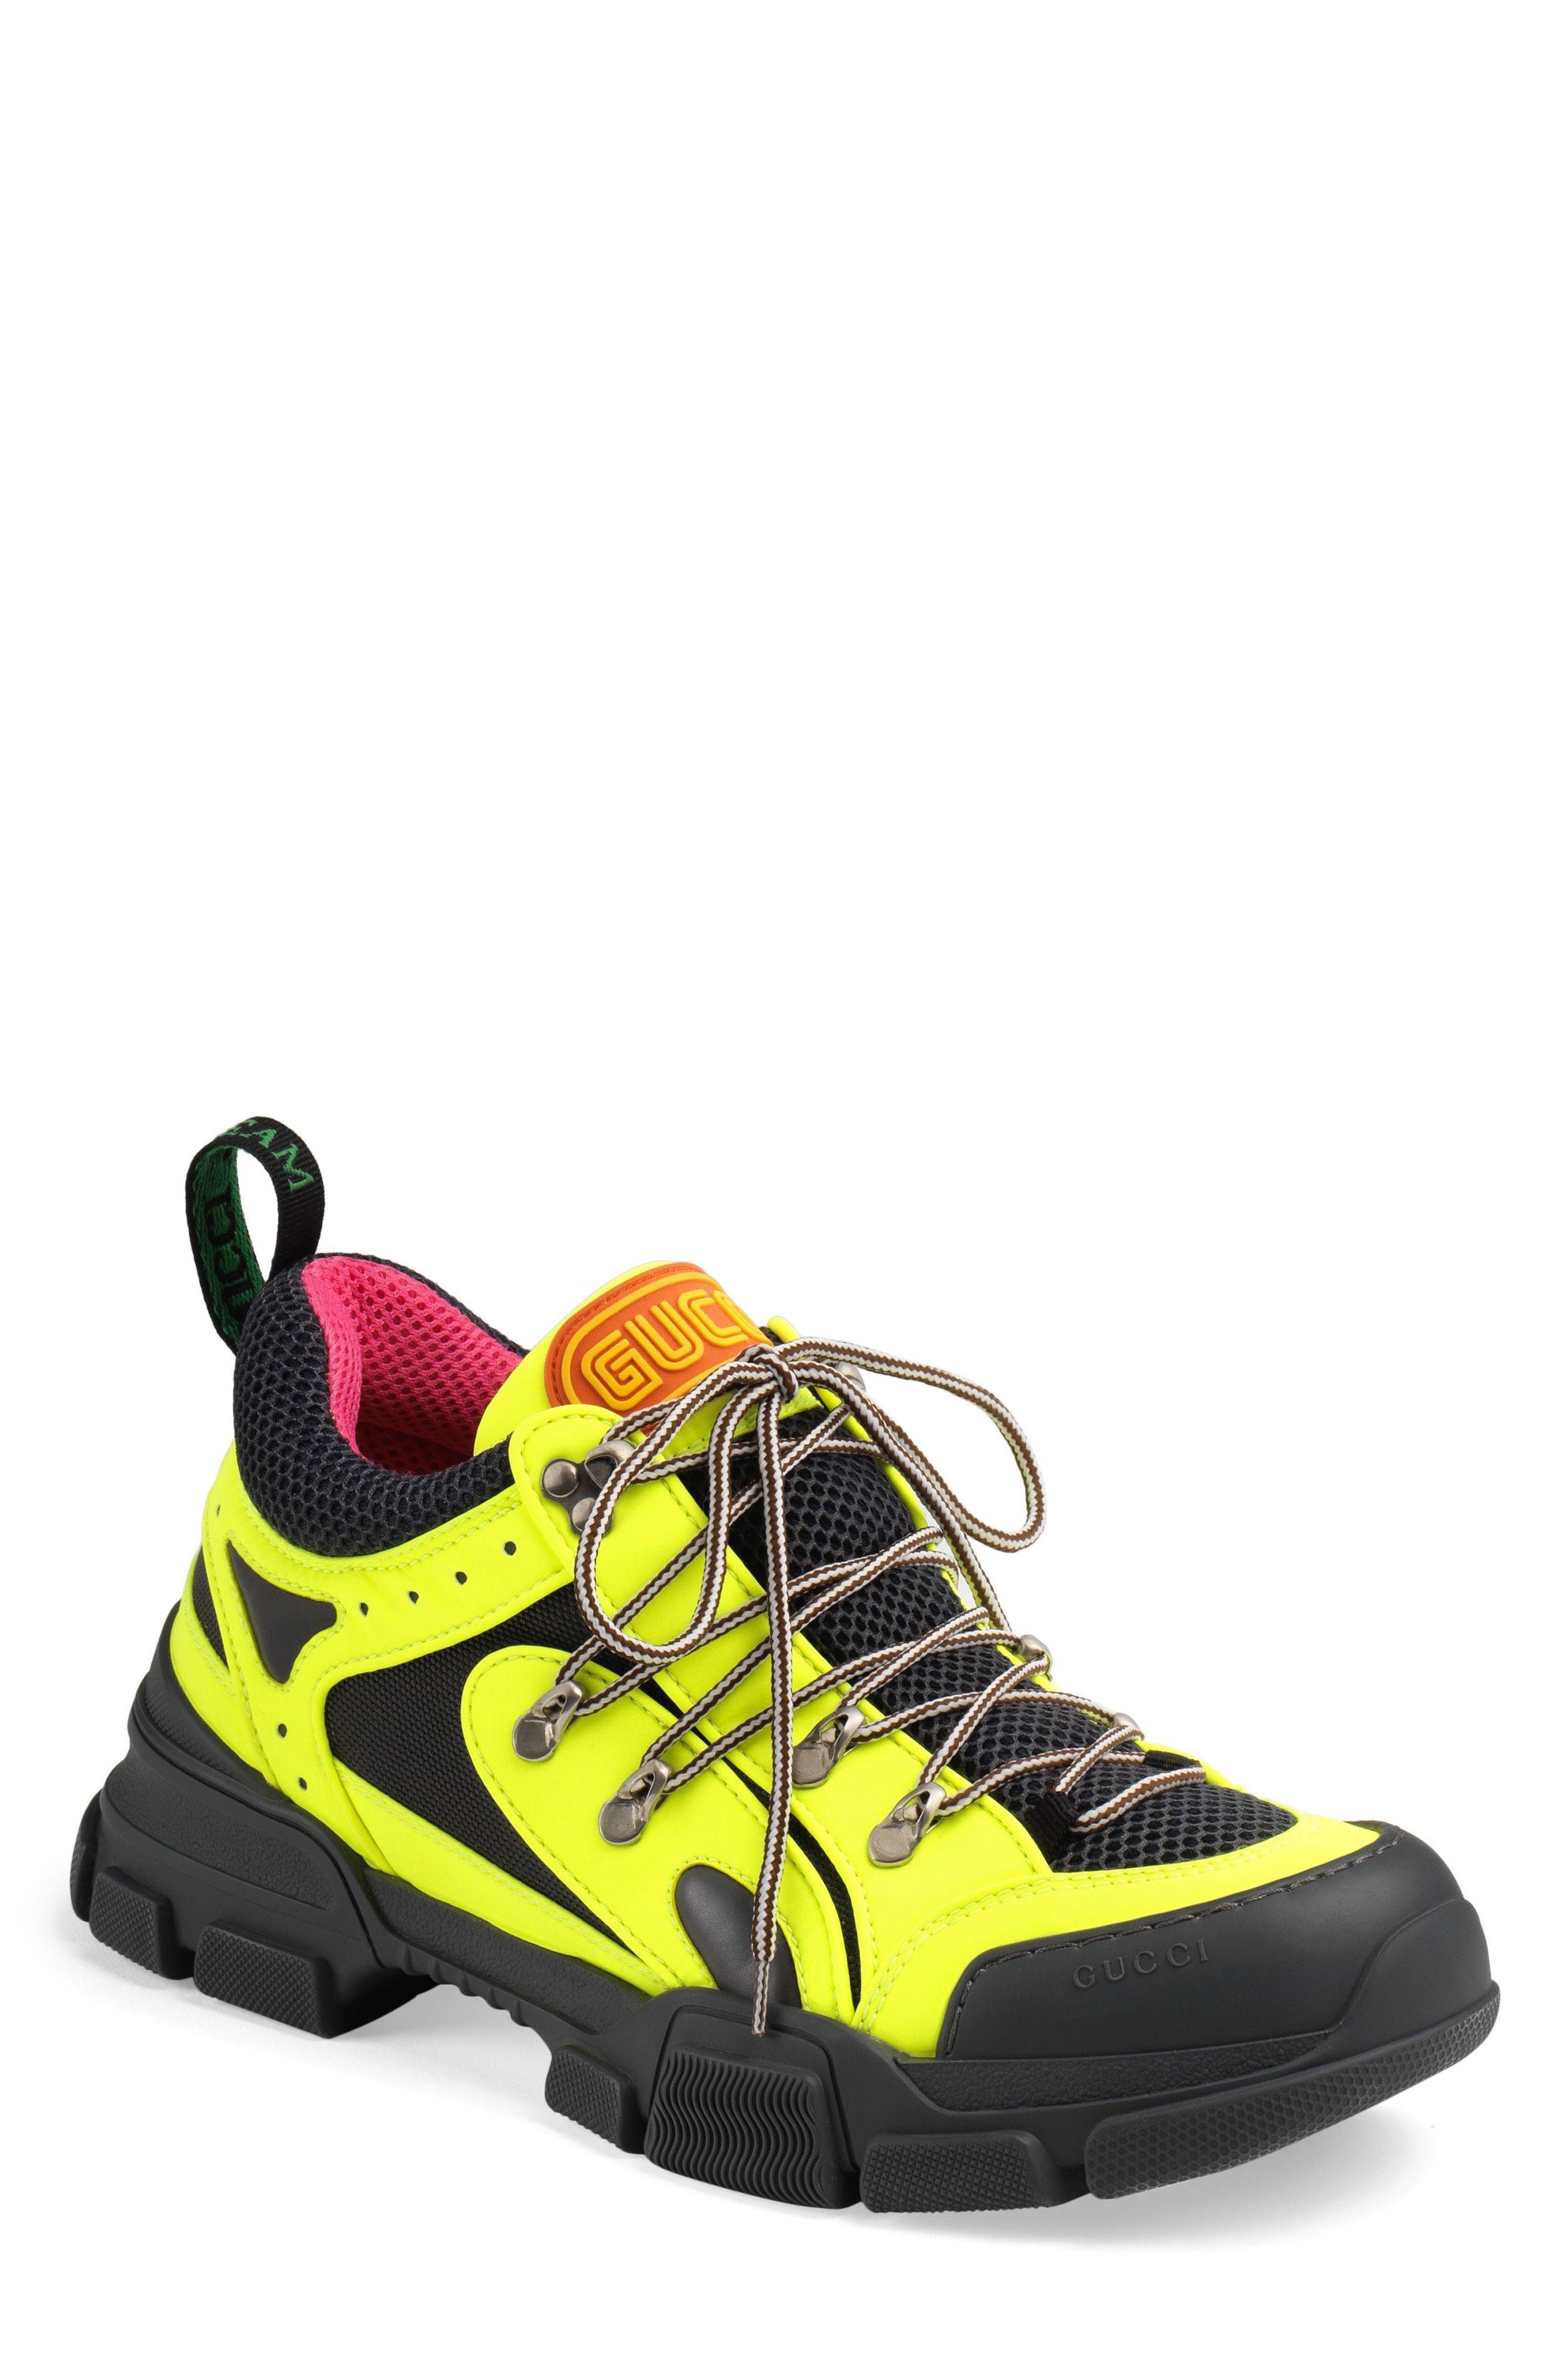 2368f70a3 Gucci Flashtrek Hiking Sneaker, $980 | Nordstrom | Lookastic.com